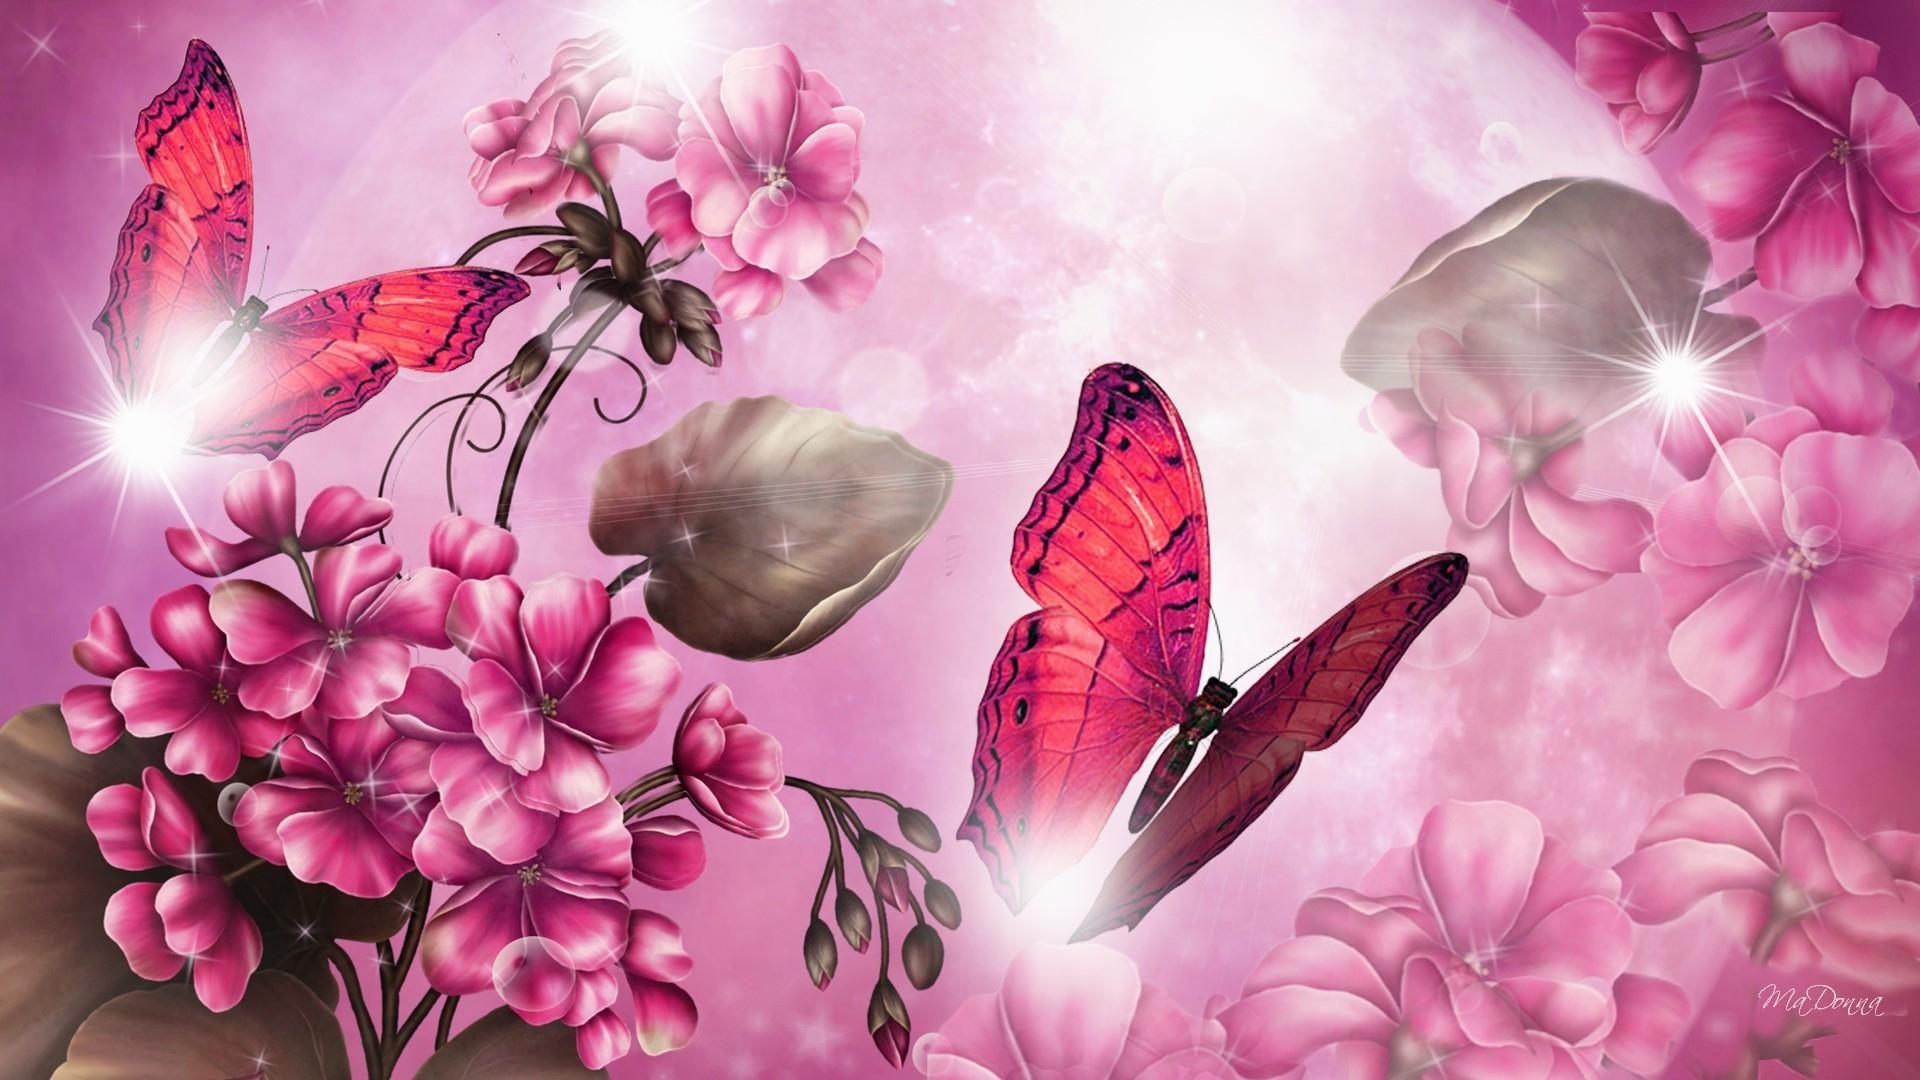 4. bright-pink-wallpaper-HD4-600×338